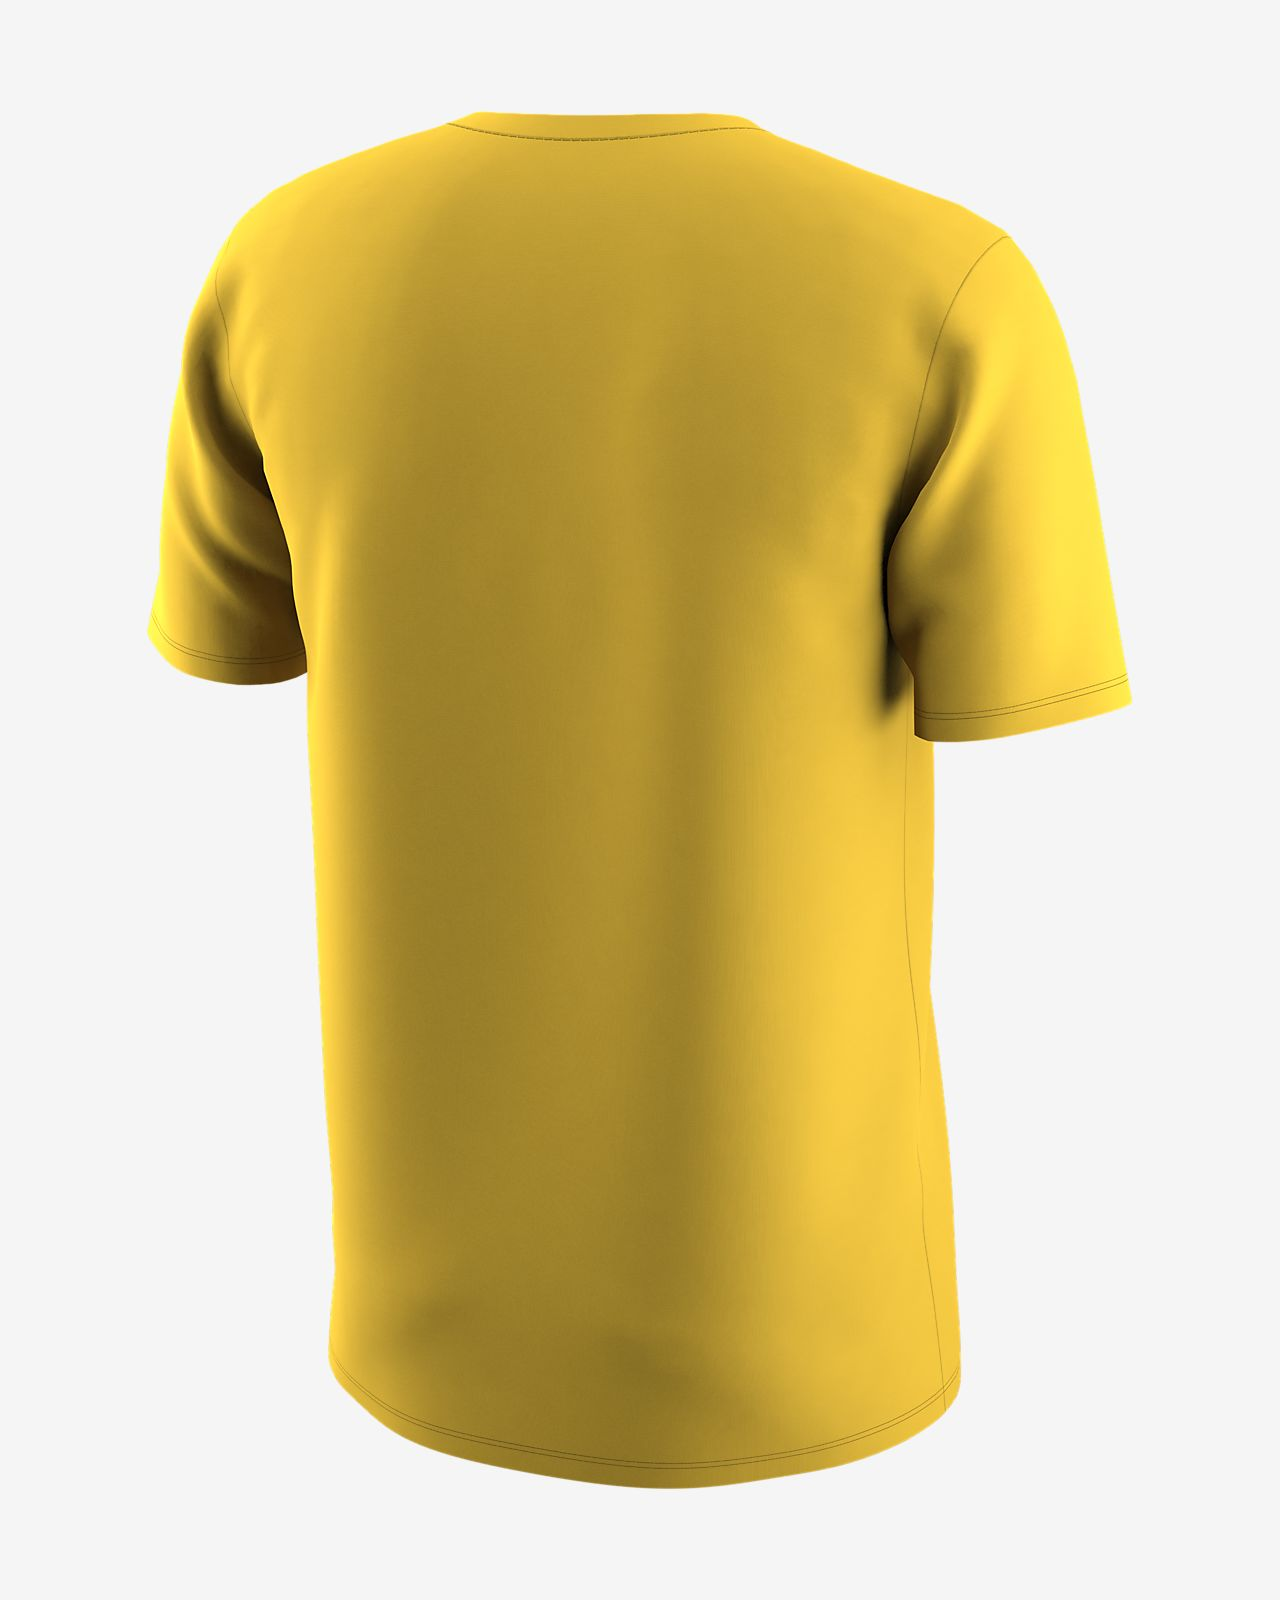 5354d3430dac3b Jordan College Retro (Michigan) Men s T-Shirt. Nike.com